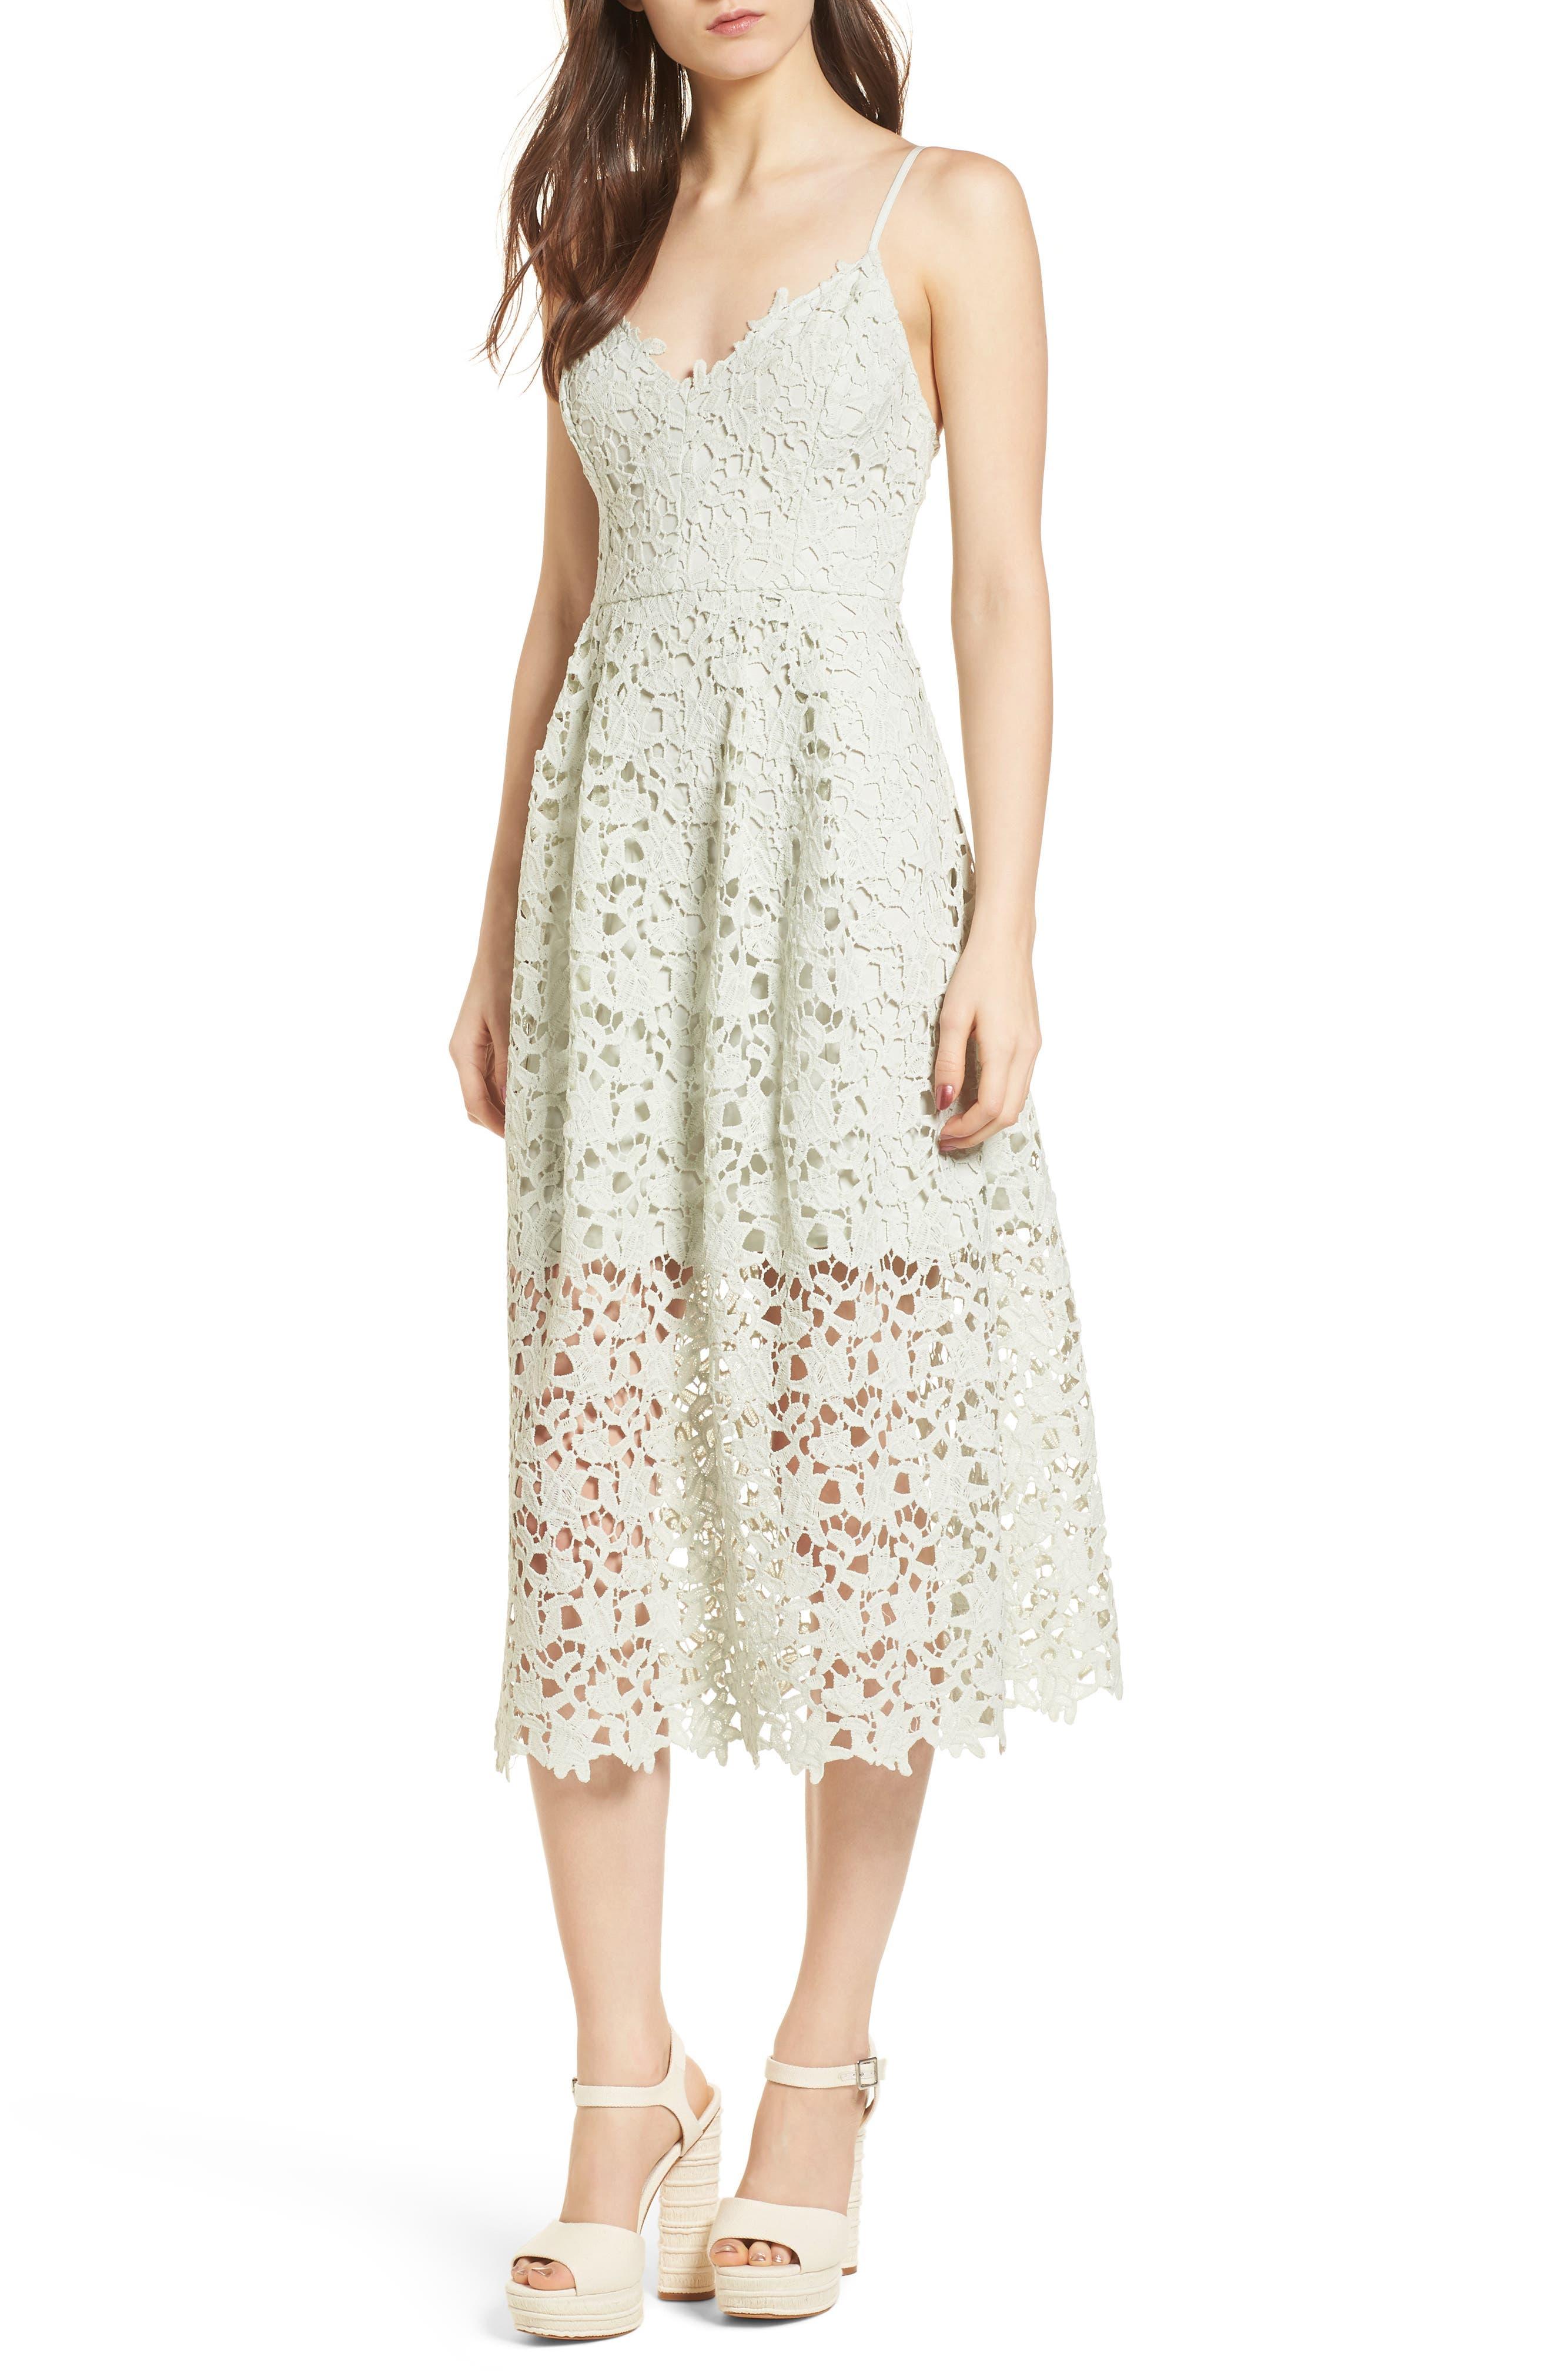 Incroyable ASTR The Label Lace Midi Dress